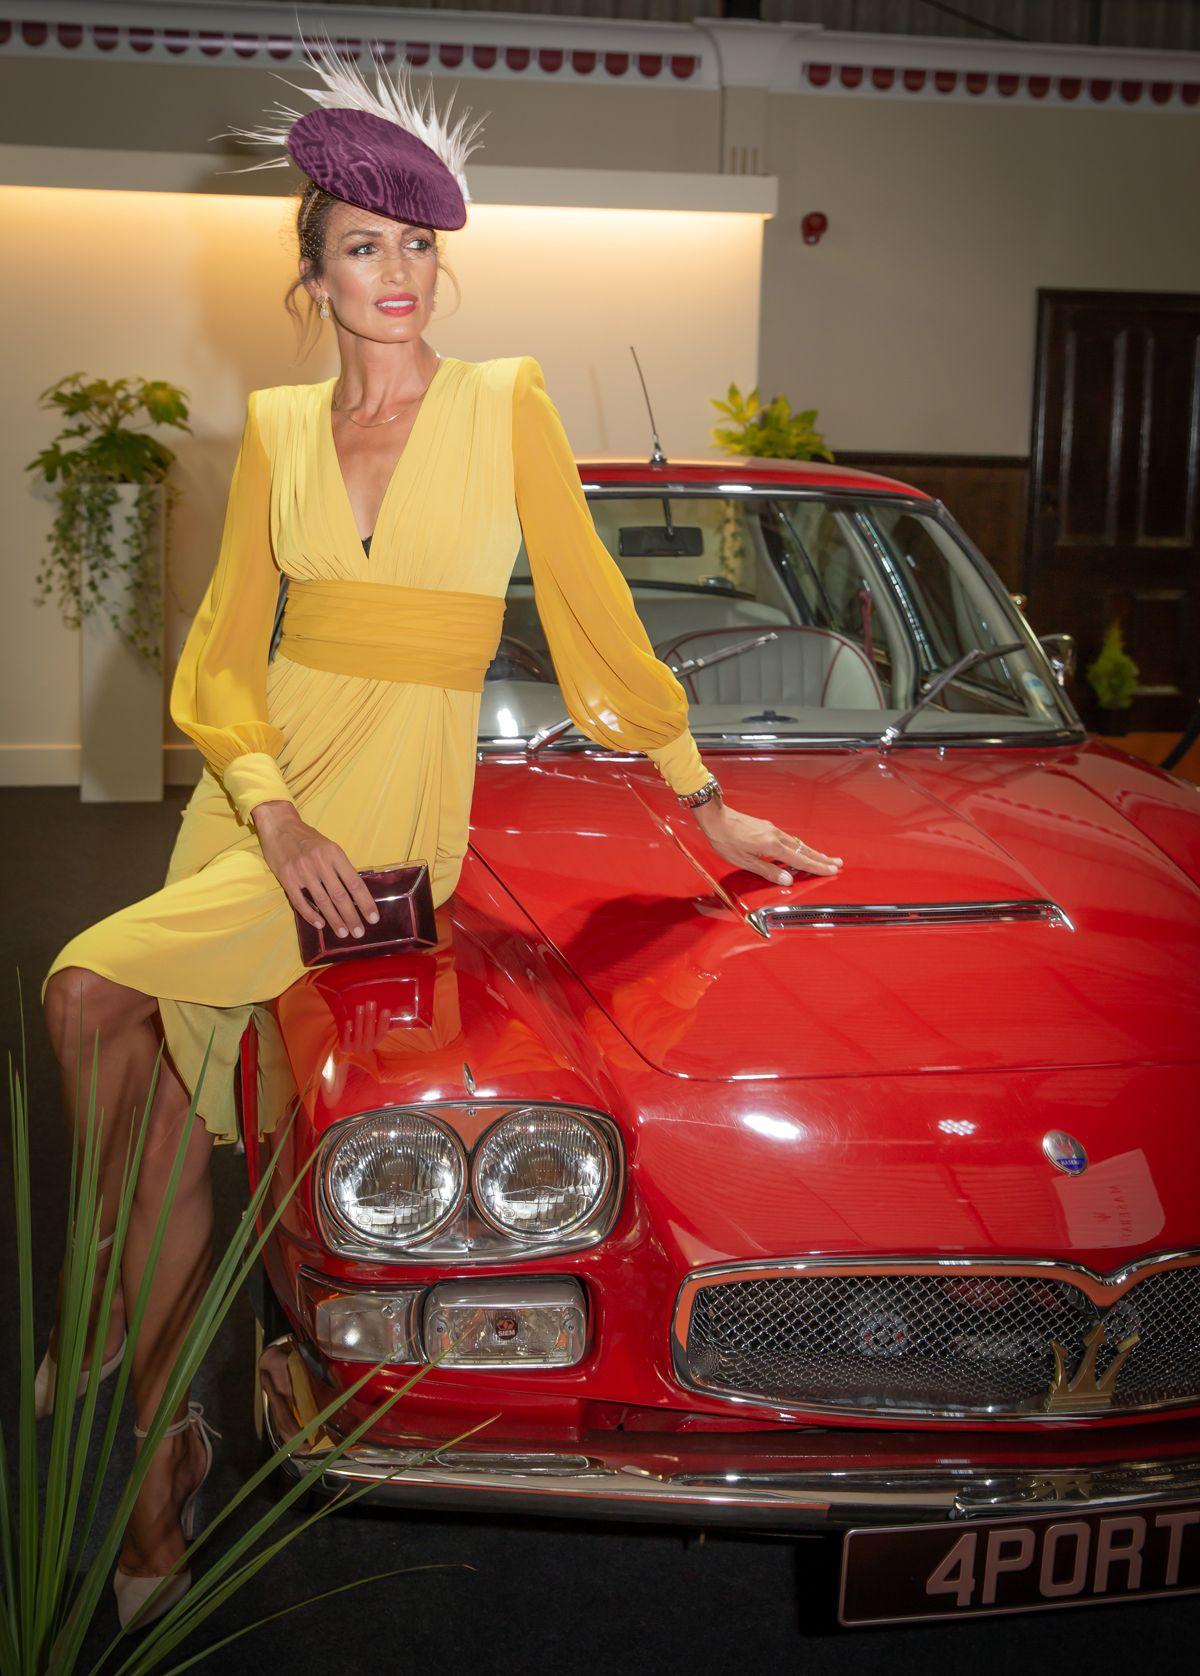 Maserati at Goodwood Revival - Nieves Alvarez at Earl's Court Motor Show